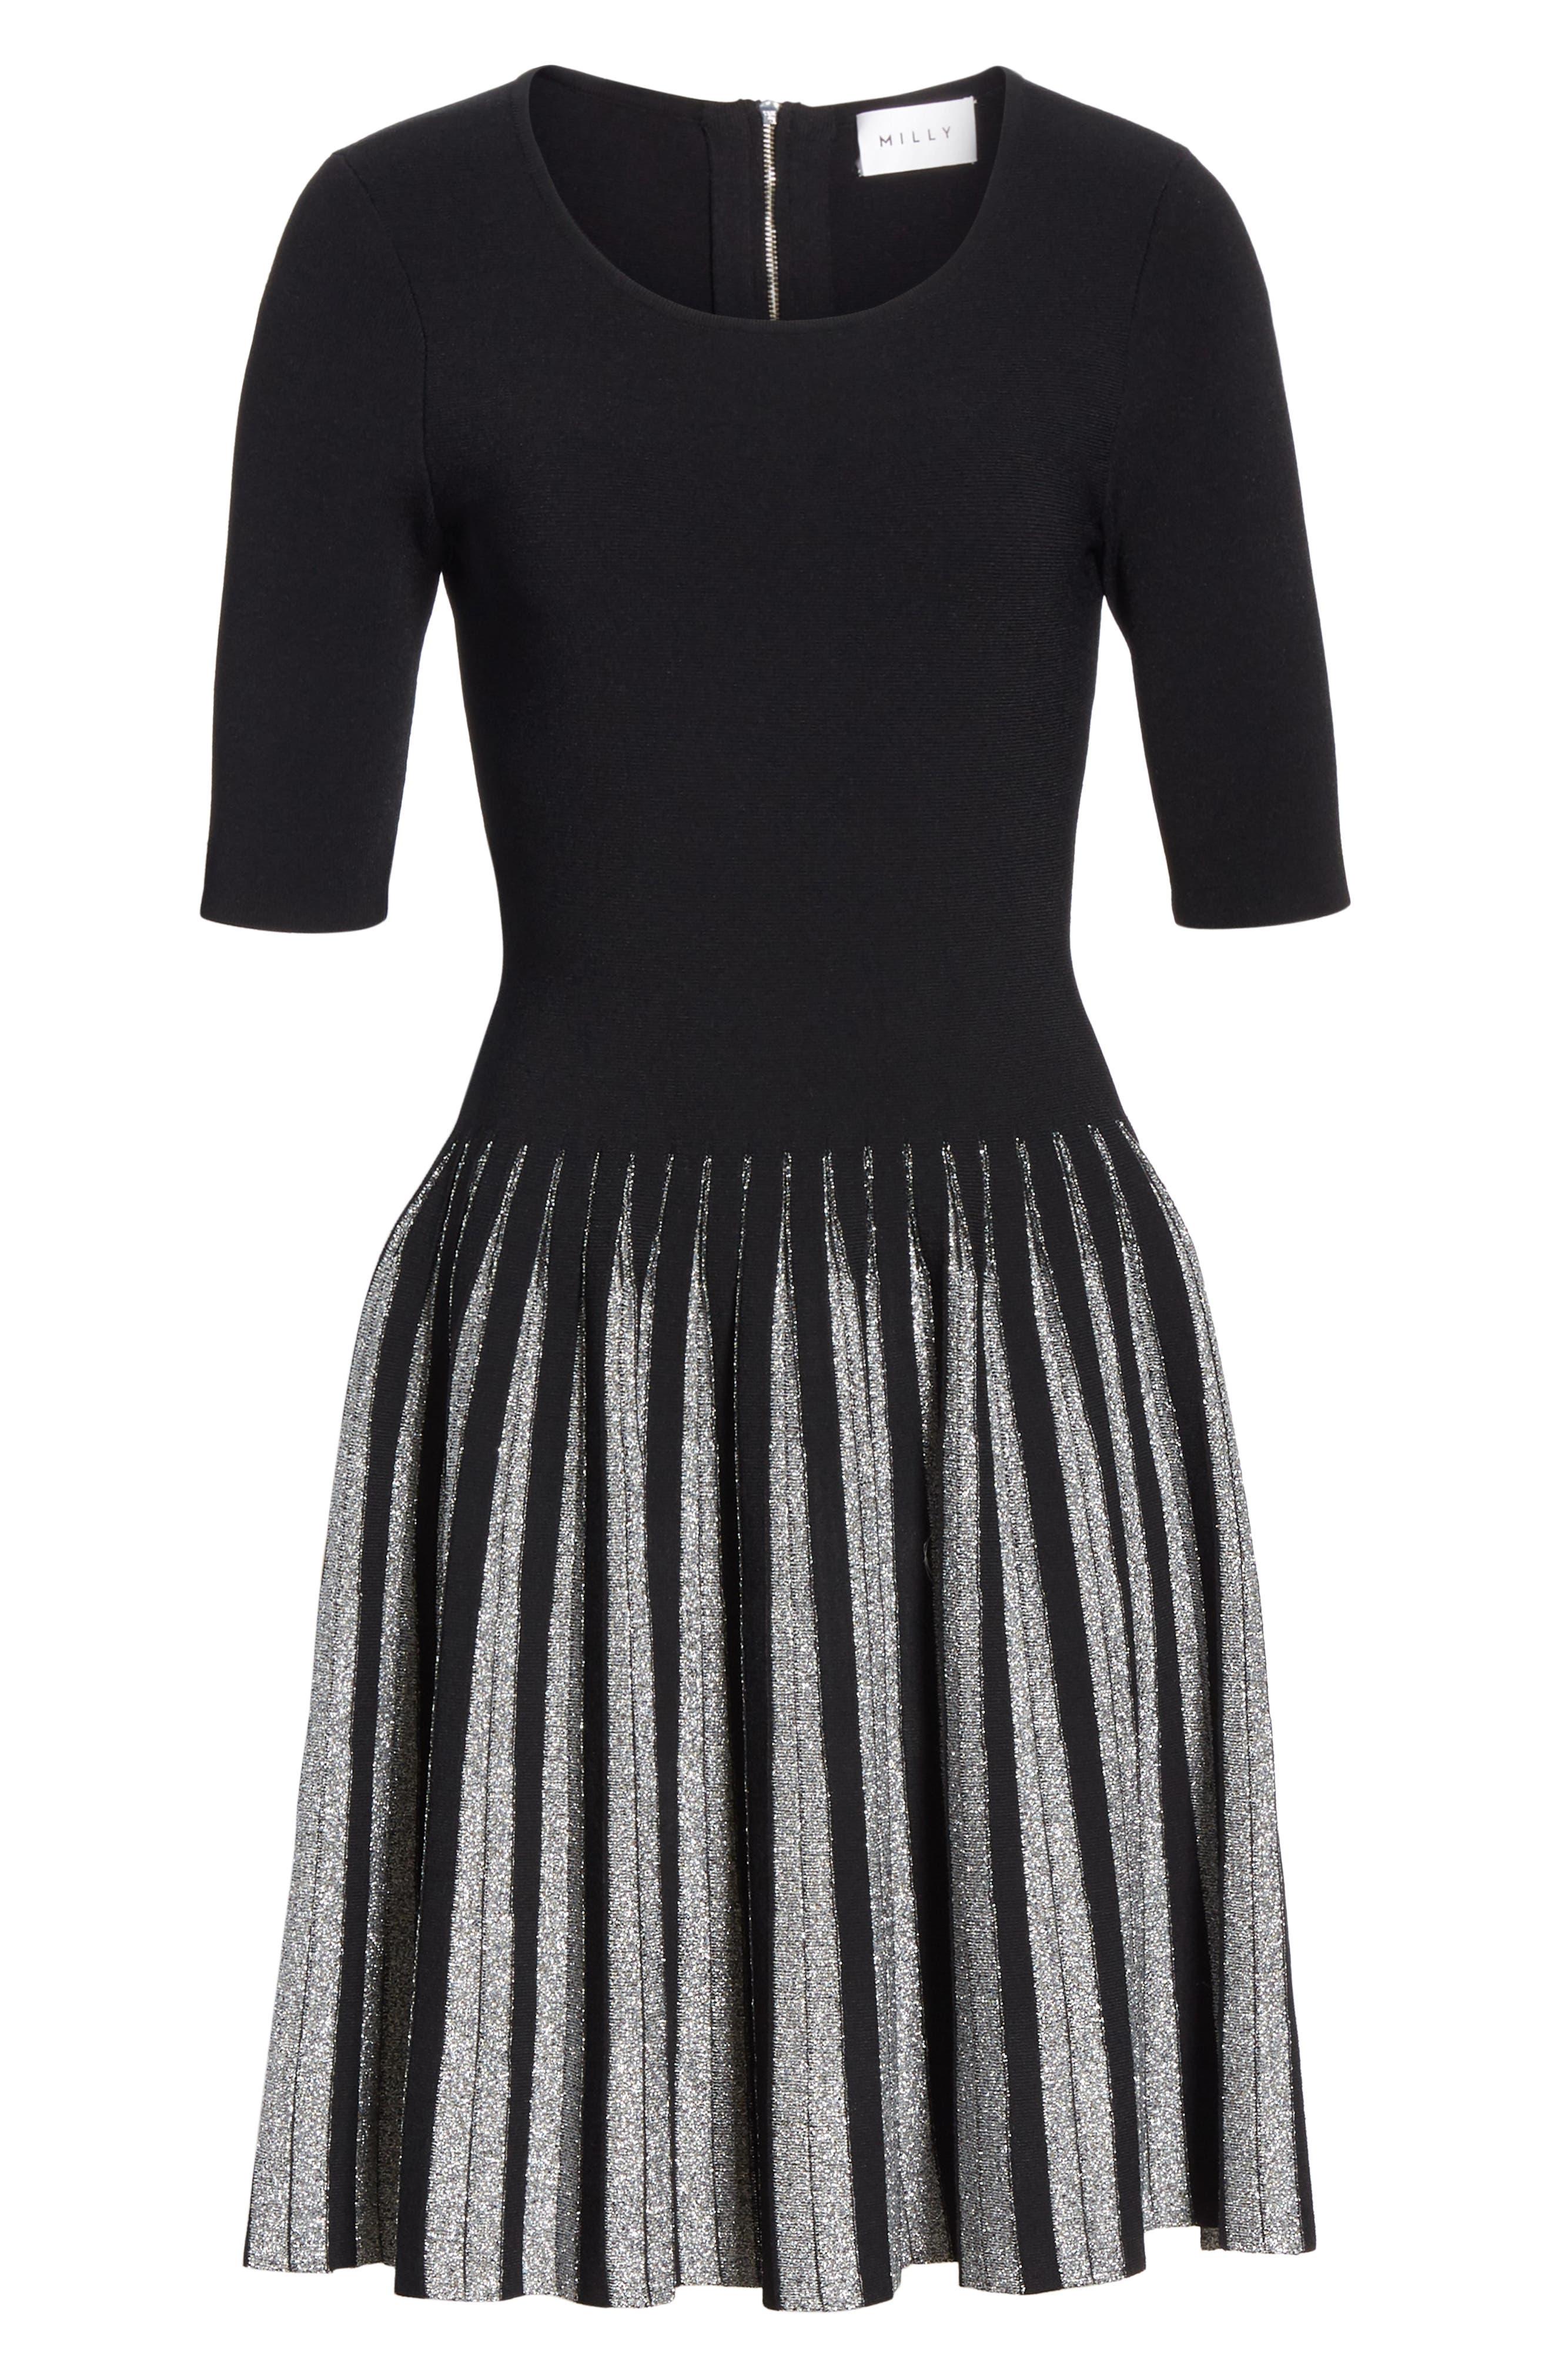 Metallic Pleat Fit & Flare Dress,                             Alternate thumbnail 6, color,                             BLACK/ SILVER